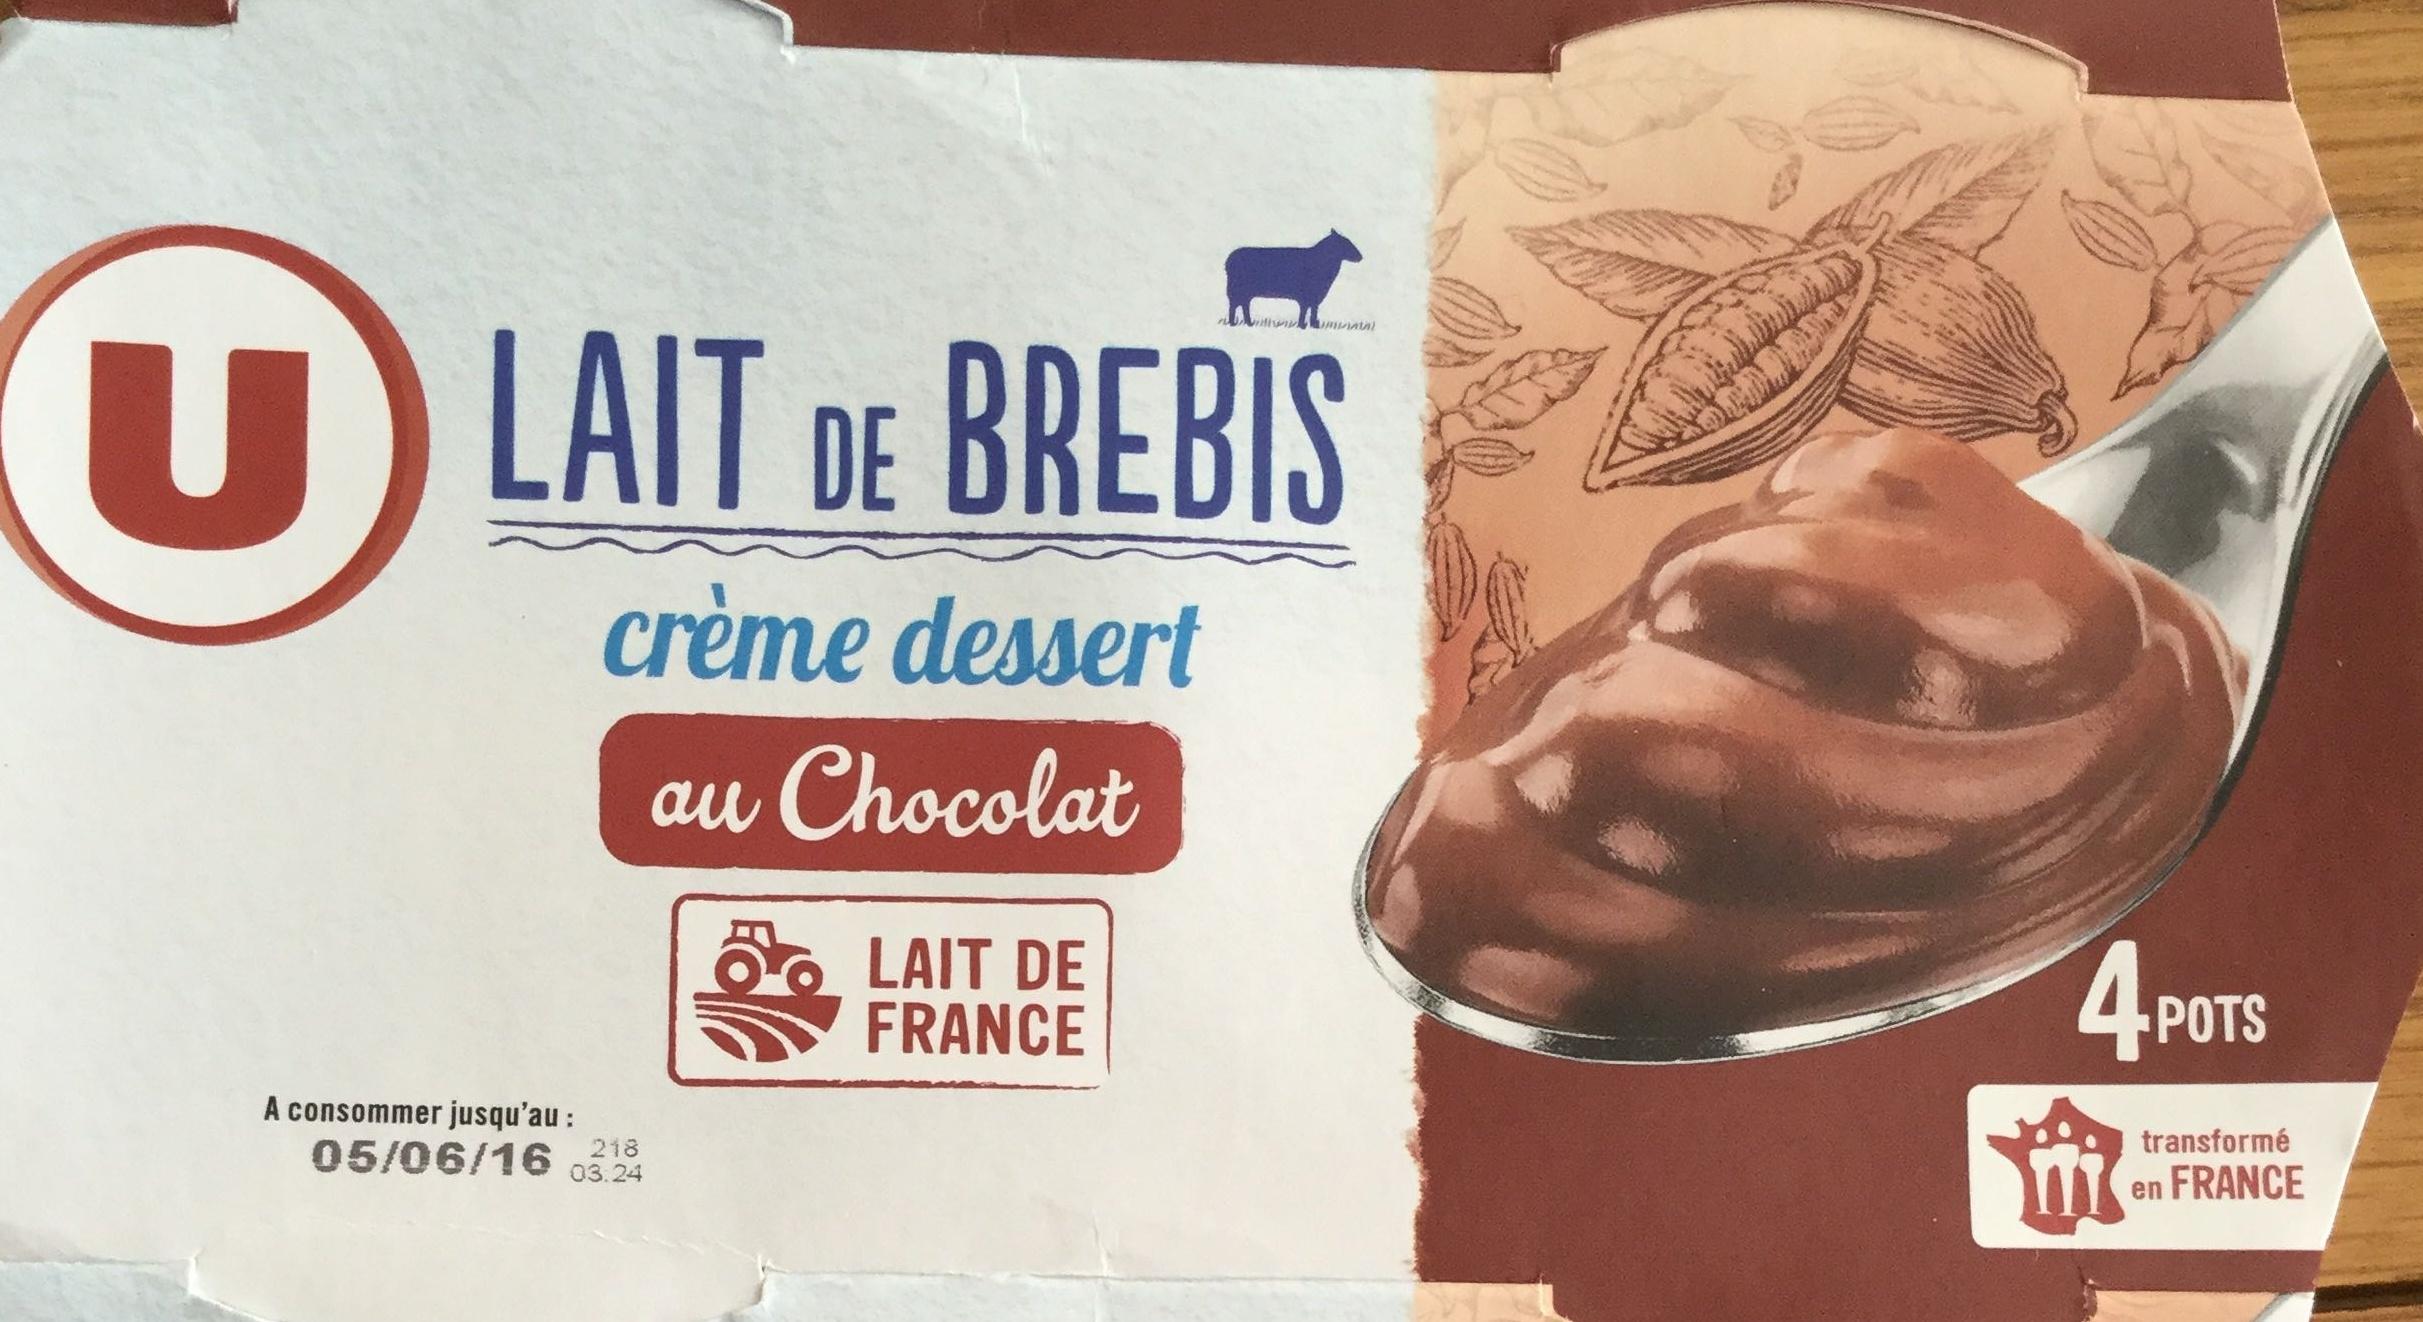 cr 232 me dessert au chocolat au lait de brebis u 460 g 4 x 115 g